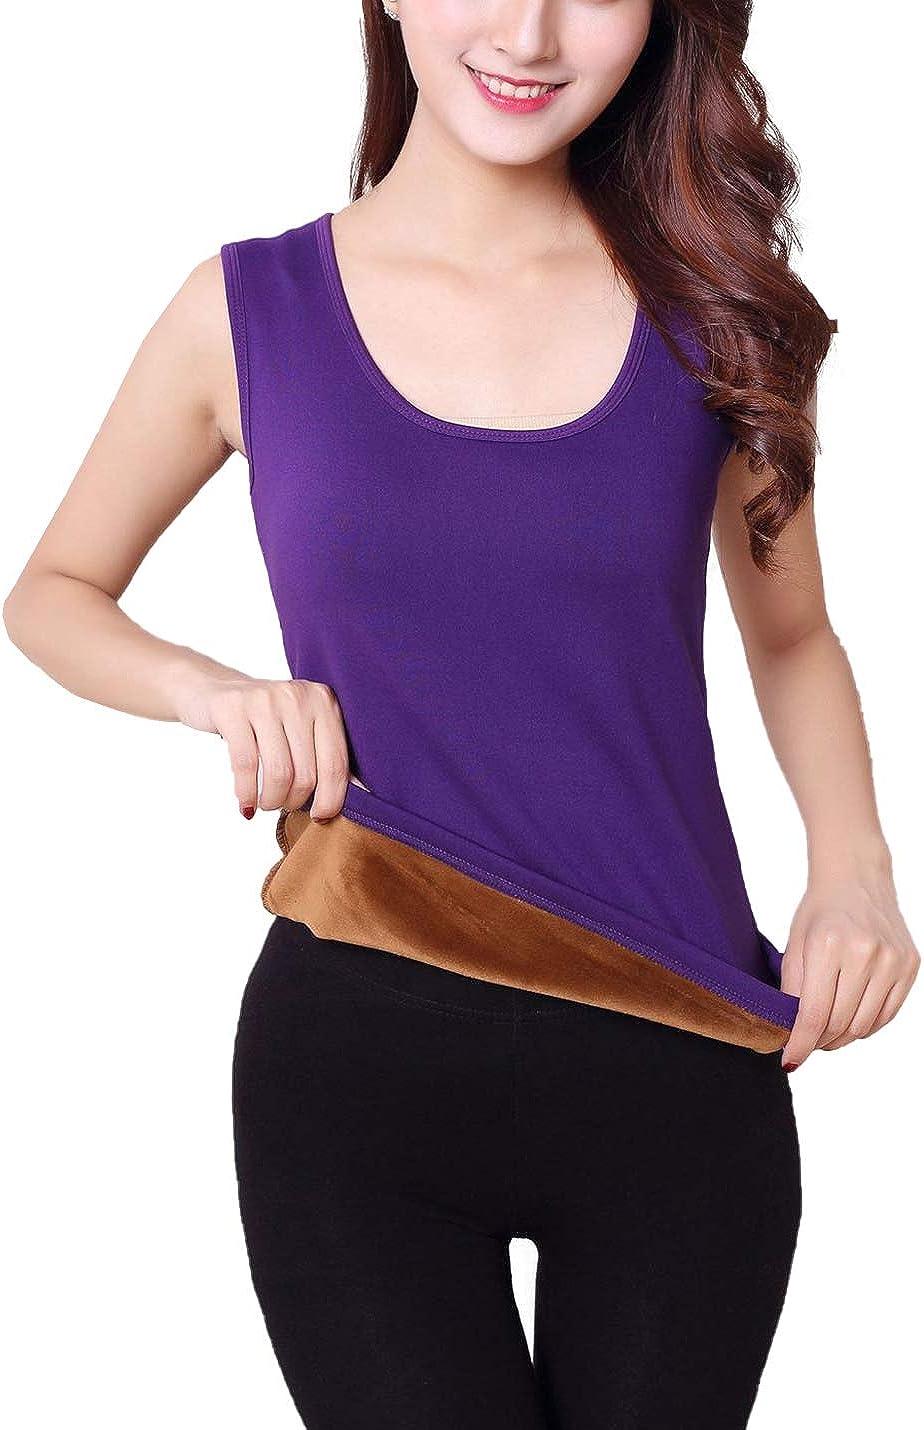 Flygo Women's Cotton Thermal Fleece Lined Underwear Shirt Cami Tank Top Vest